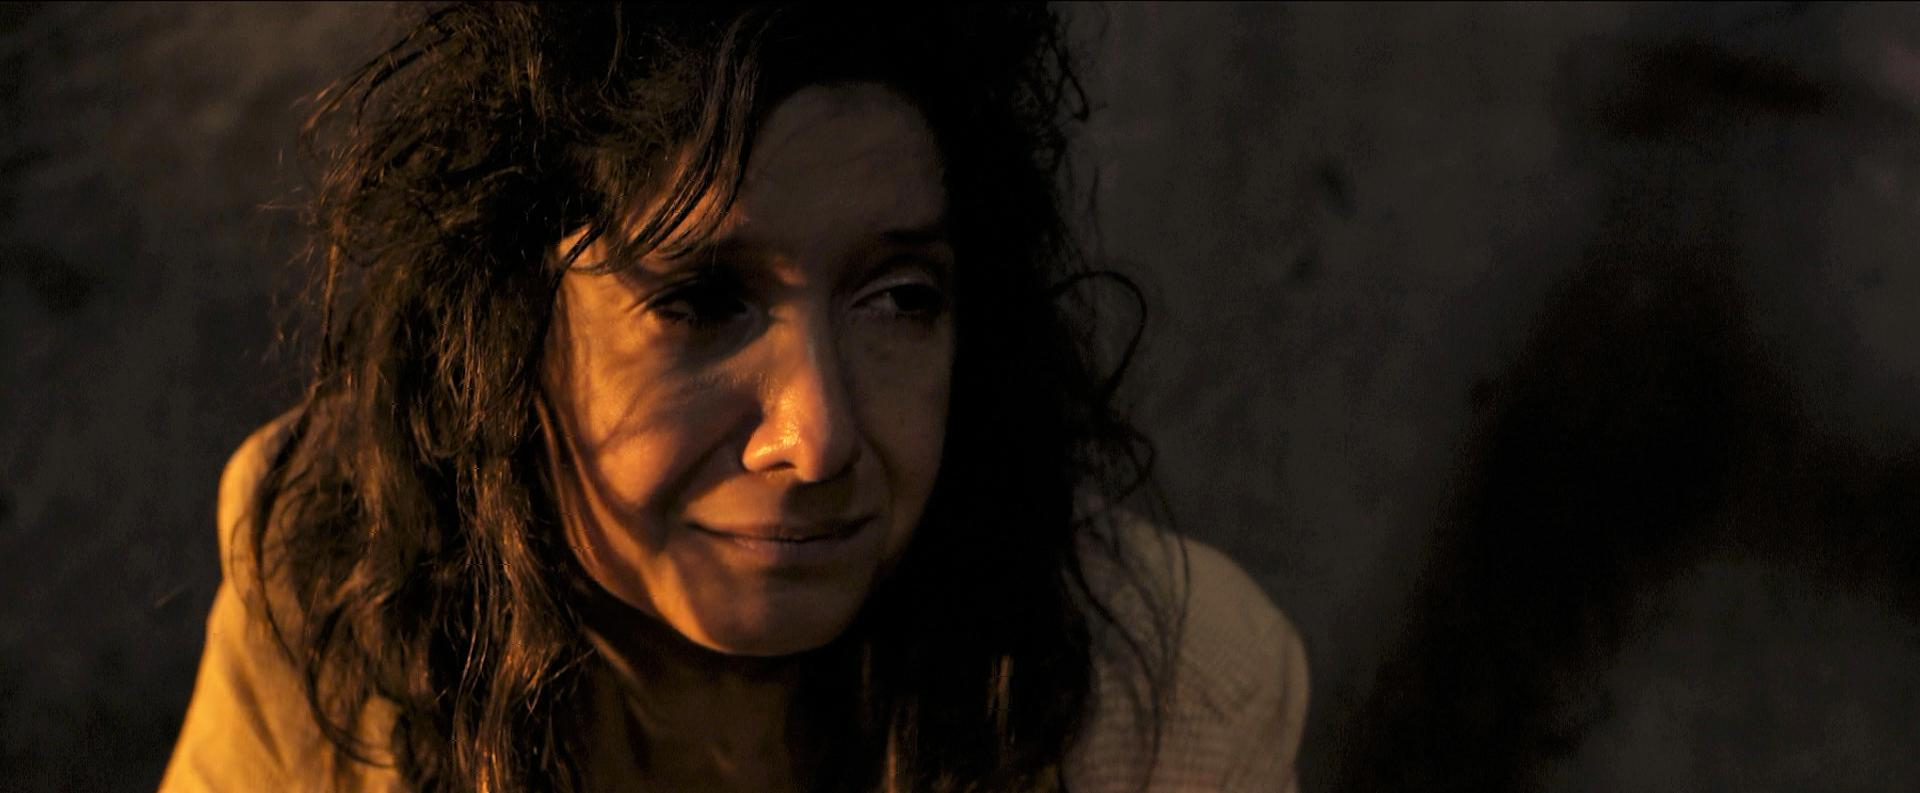 Claudia Aravena in Trauma (2017)